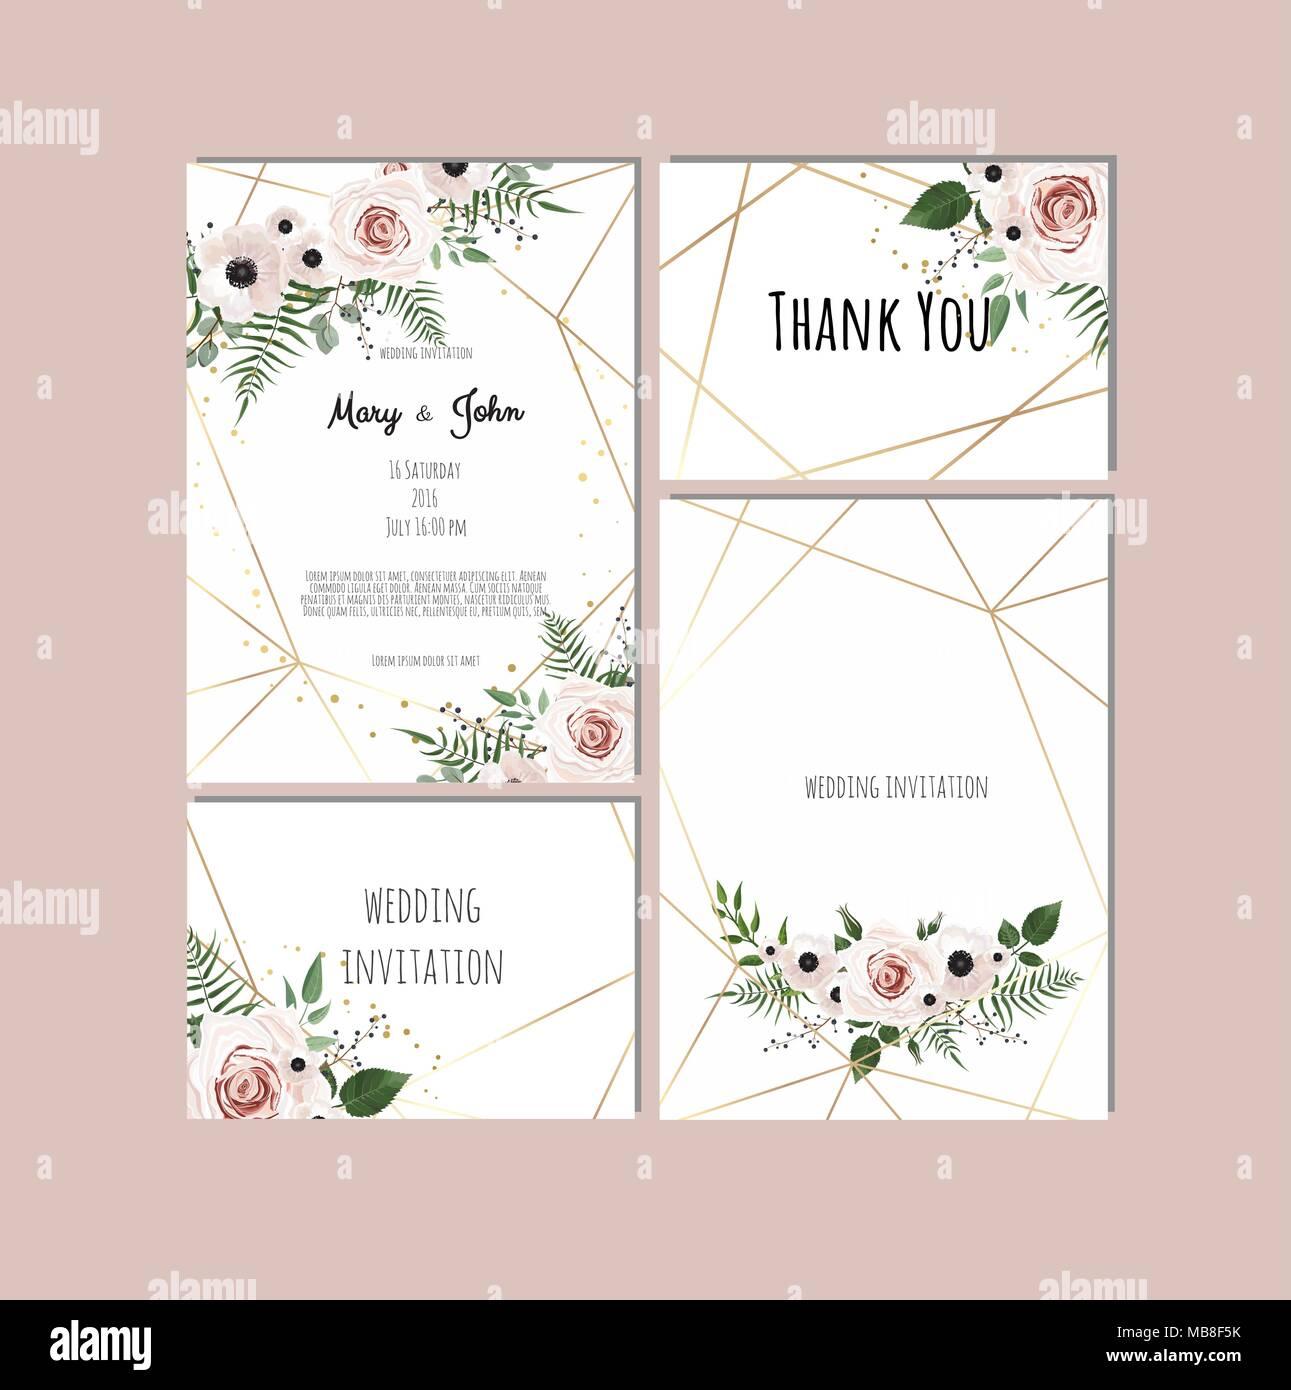 Wedding set with invitations. Vector set of vintage floral wedding invitation  templates Stock Vector Image & Art - Alamy